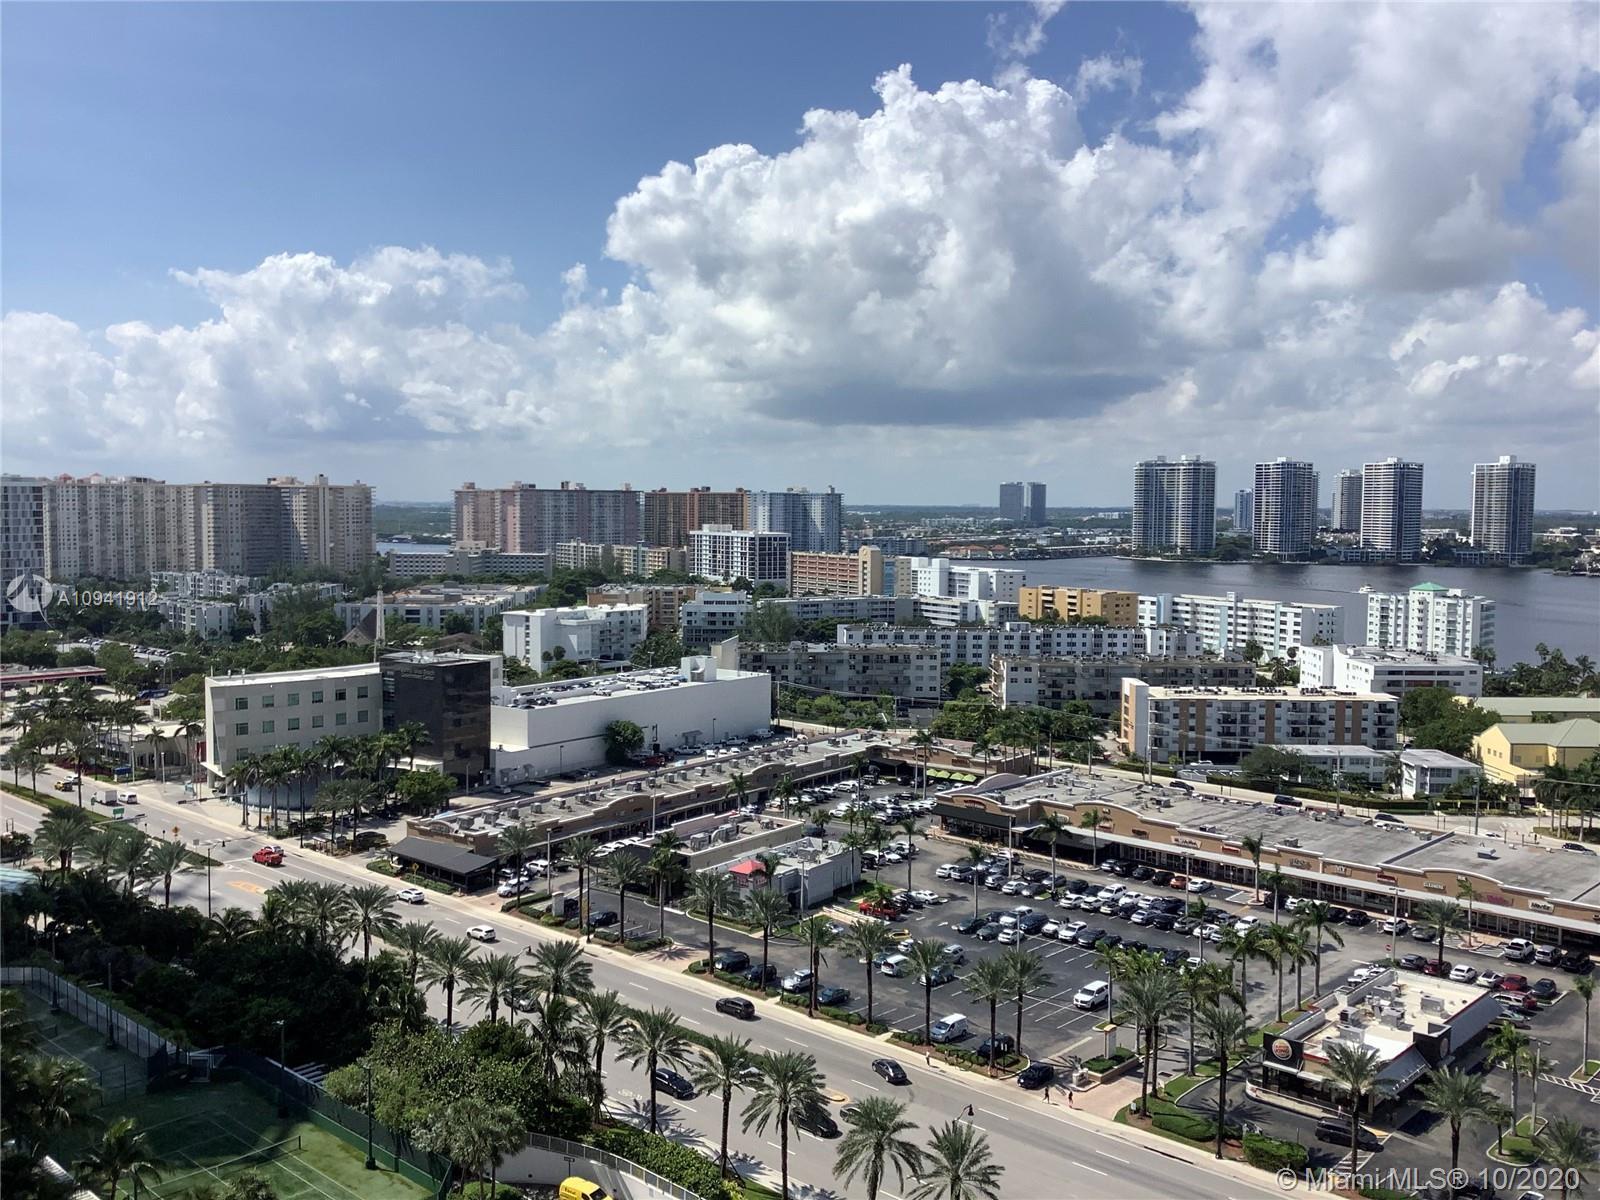 Trump Royale #2005 - 18201 Collins Ave #2005, Sunny Isles Beach, FL 33160